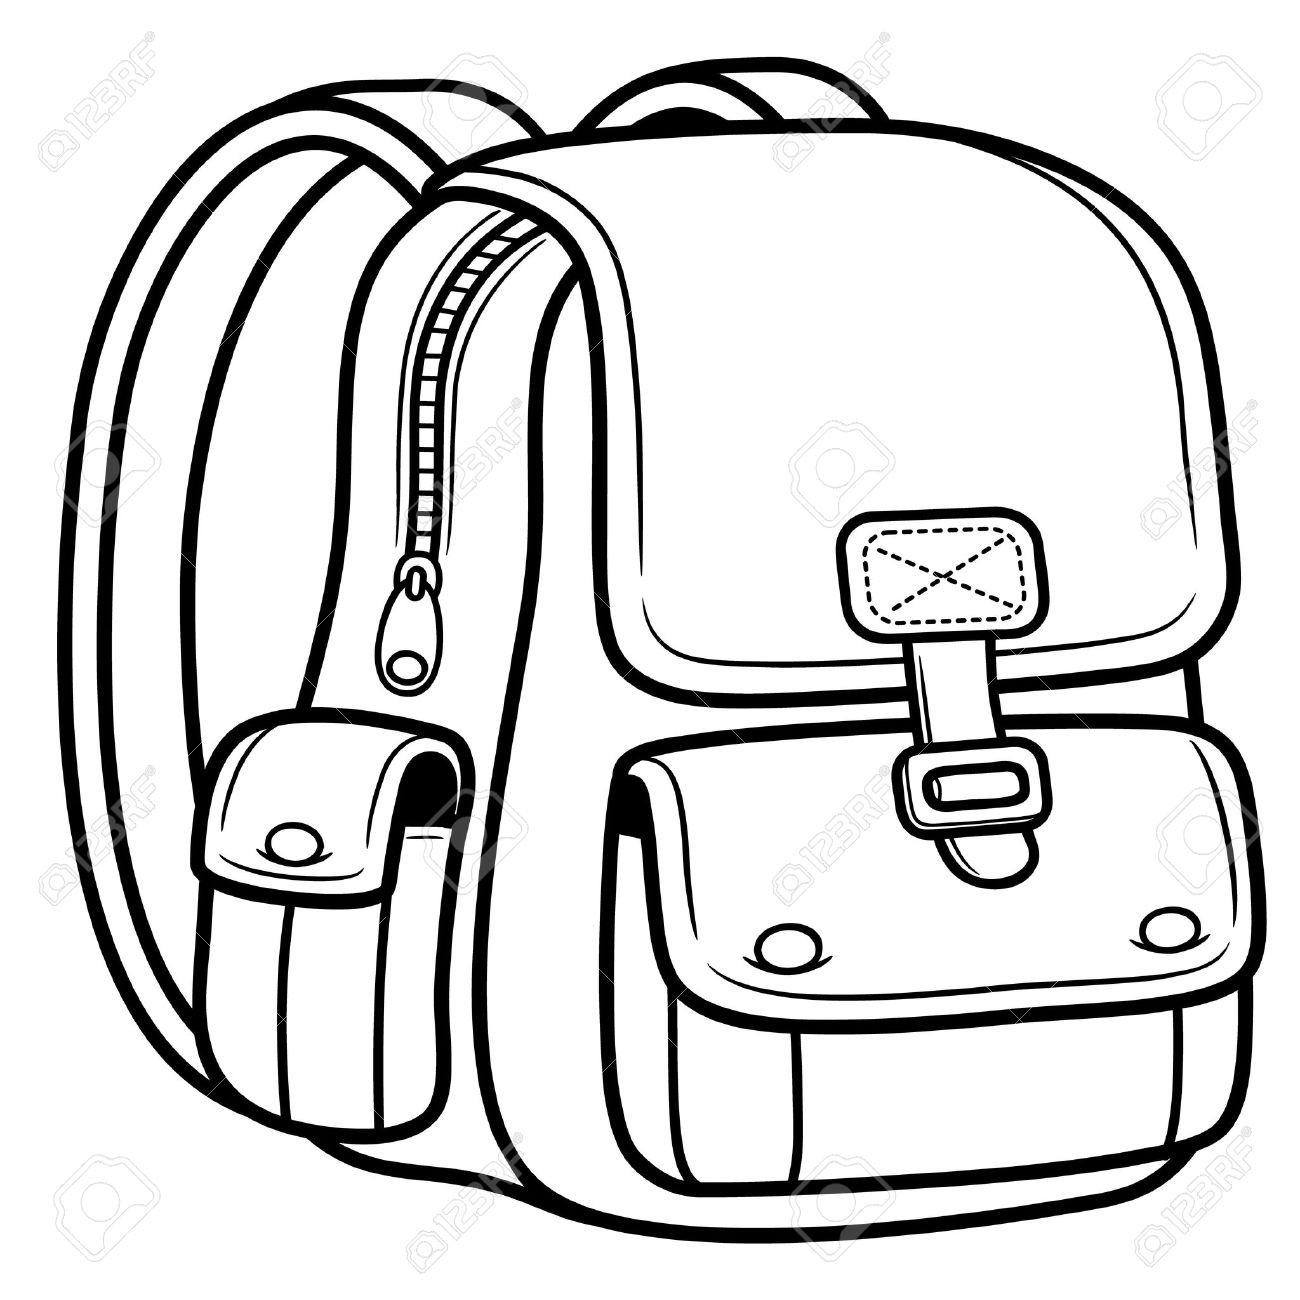 Bookbag clipart school bag. Outline backpack black and